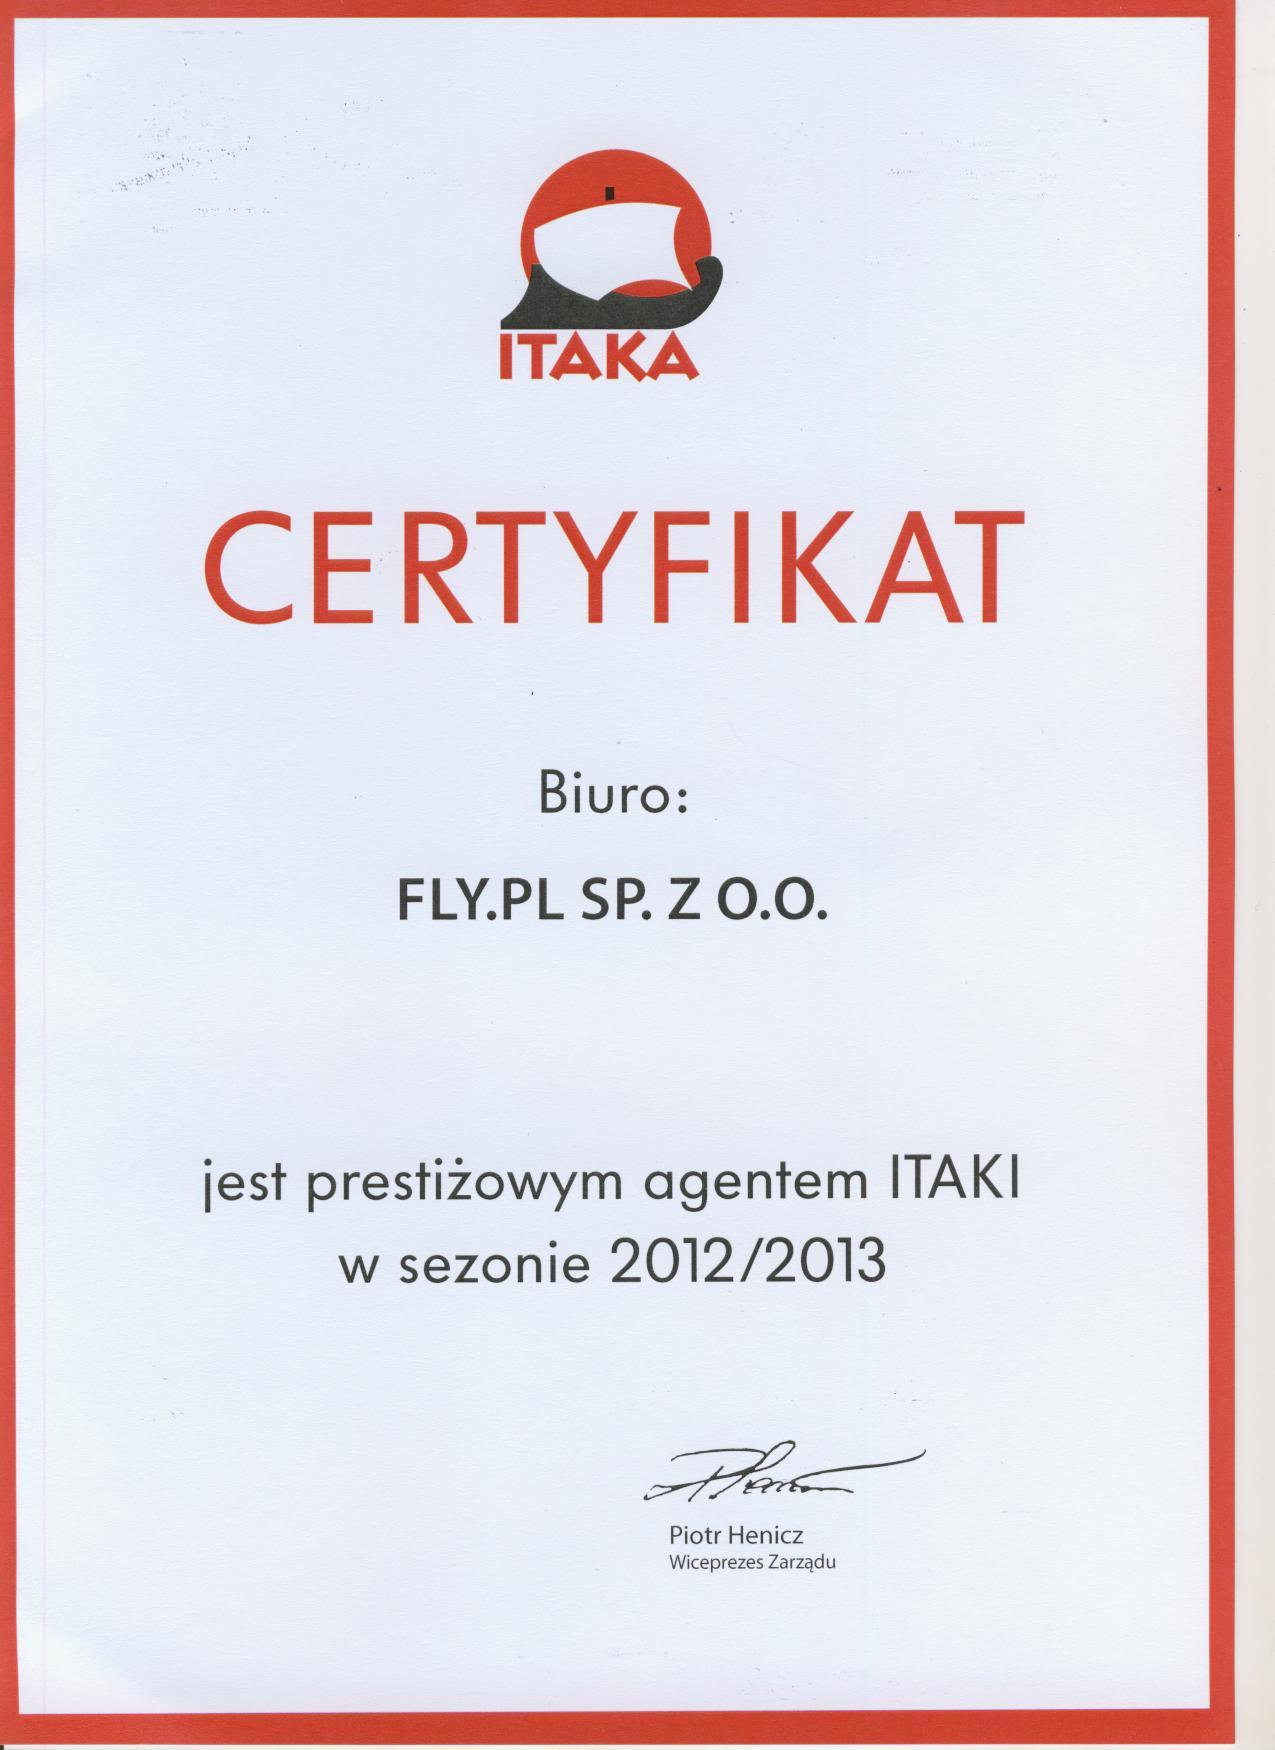 Prestiżowy Agent Itaka 2013